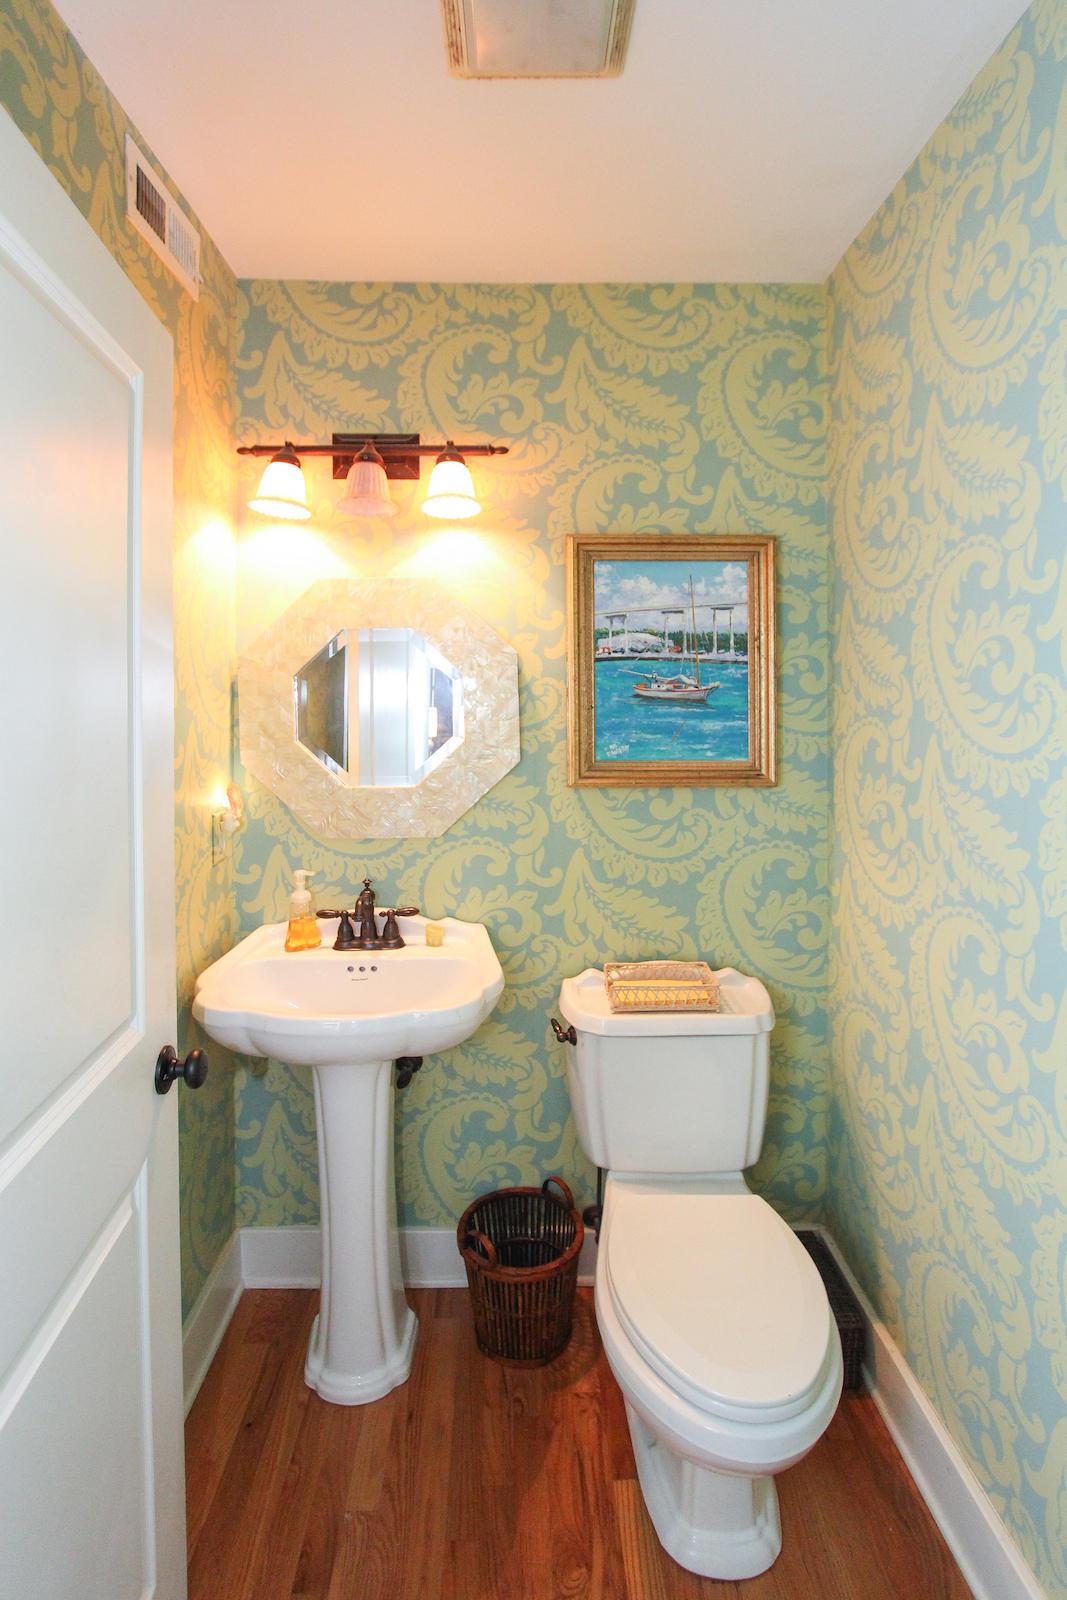 Albemarle Point Homes For Sale - 3 Albemarle, Charleston, SC - 11